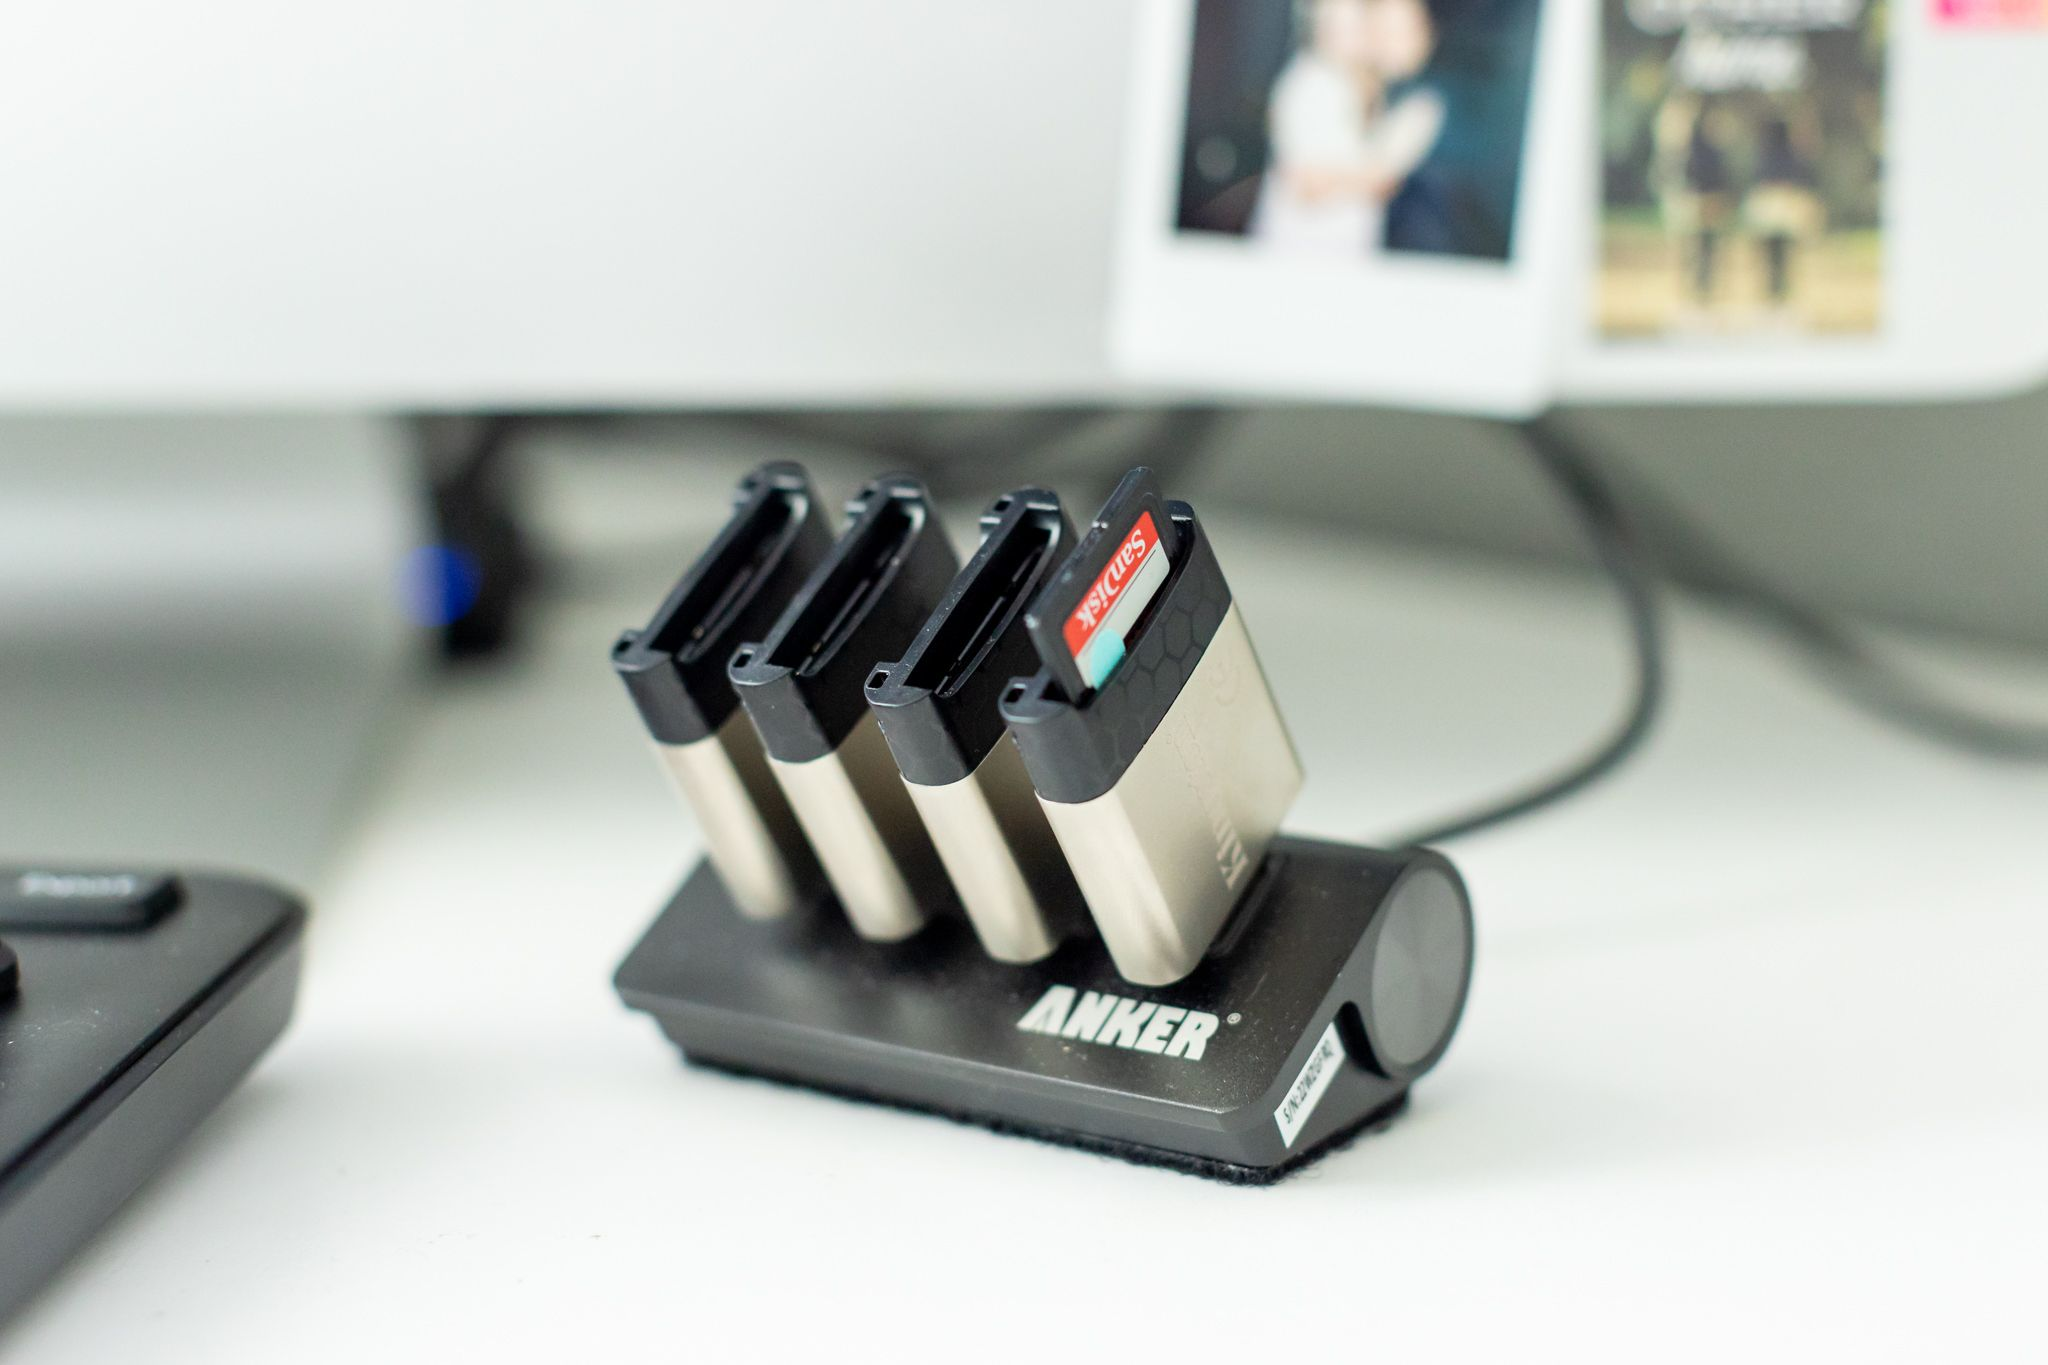 Diy Multi Card Reader For Photographers Dawn Elizabeth Studios Photography Education Cloud Backup Card Reader